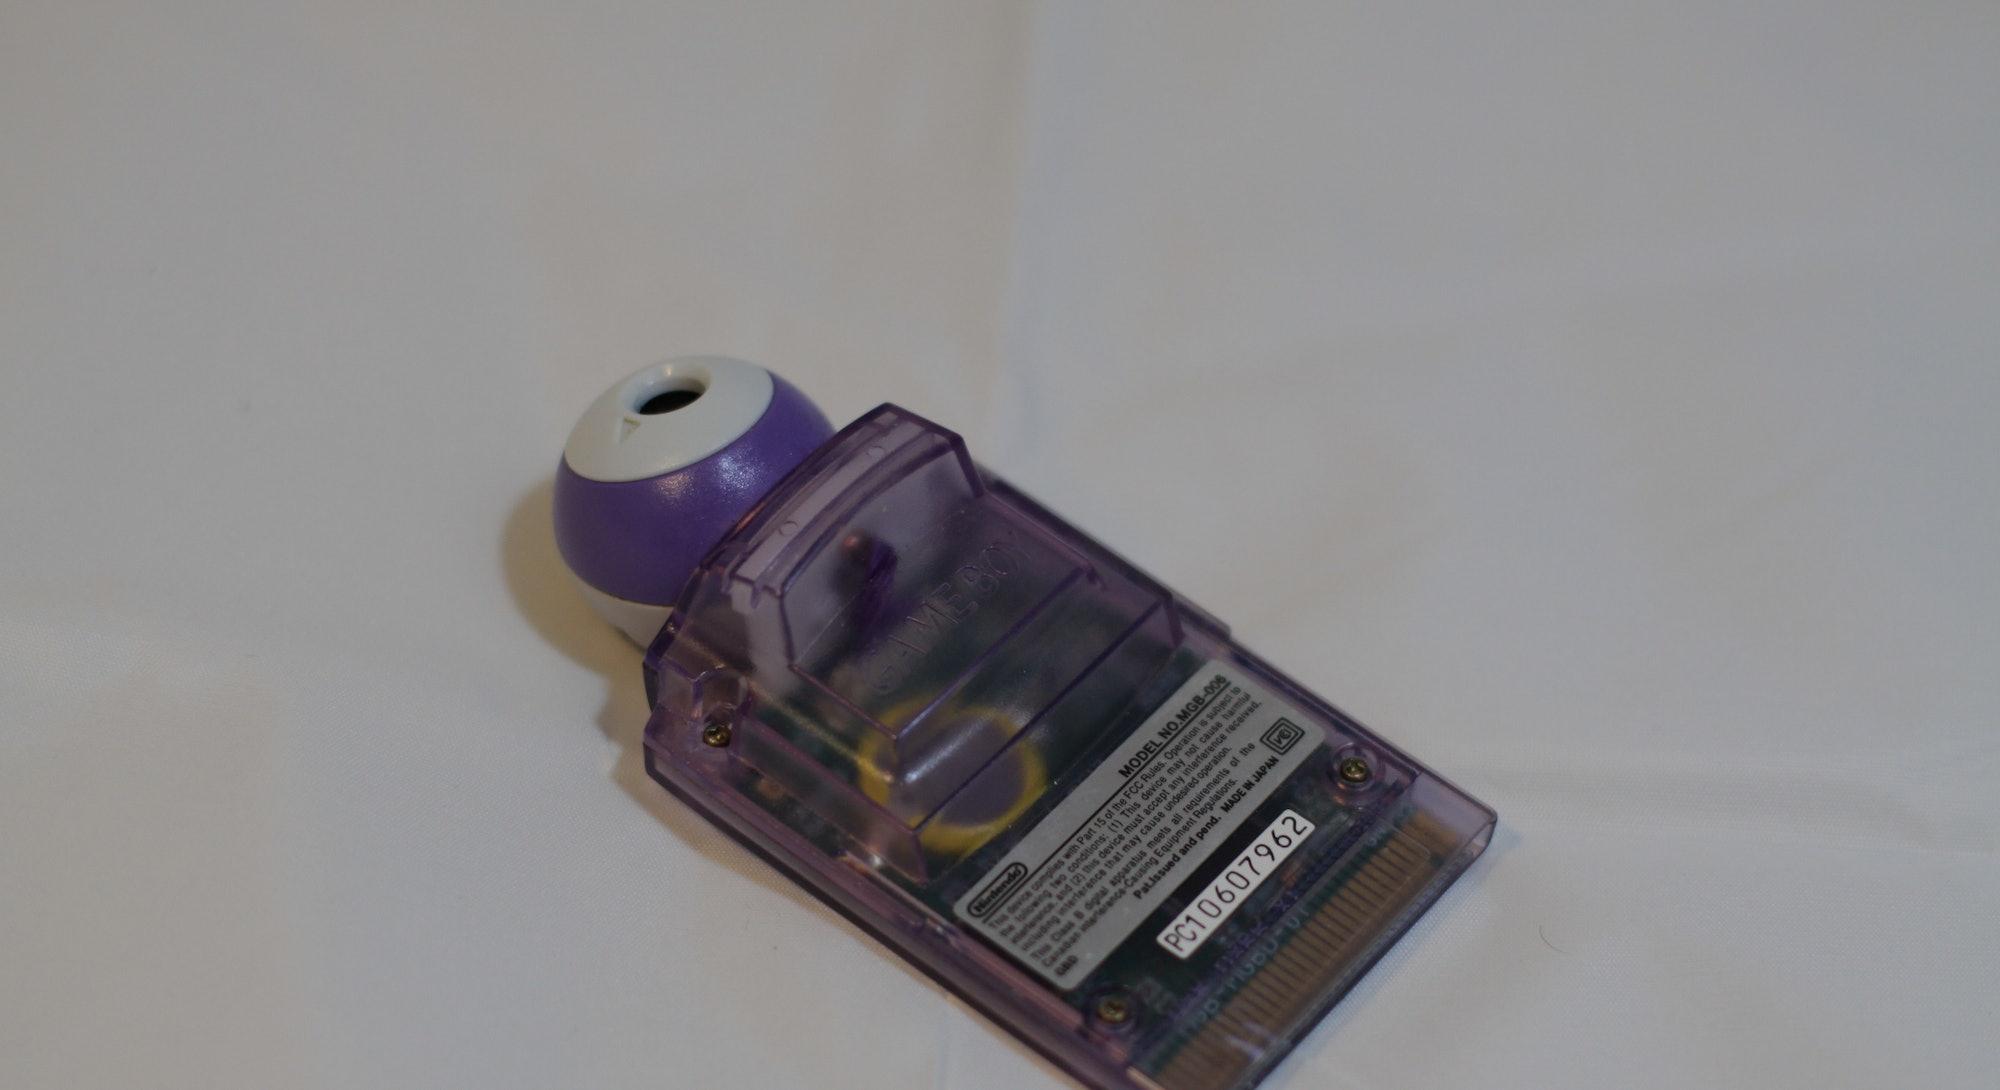 Atomic Purple Game Boy Camera owned by Herr Zatacke